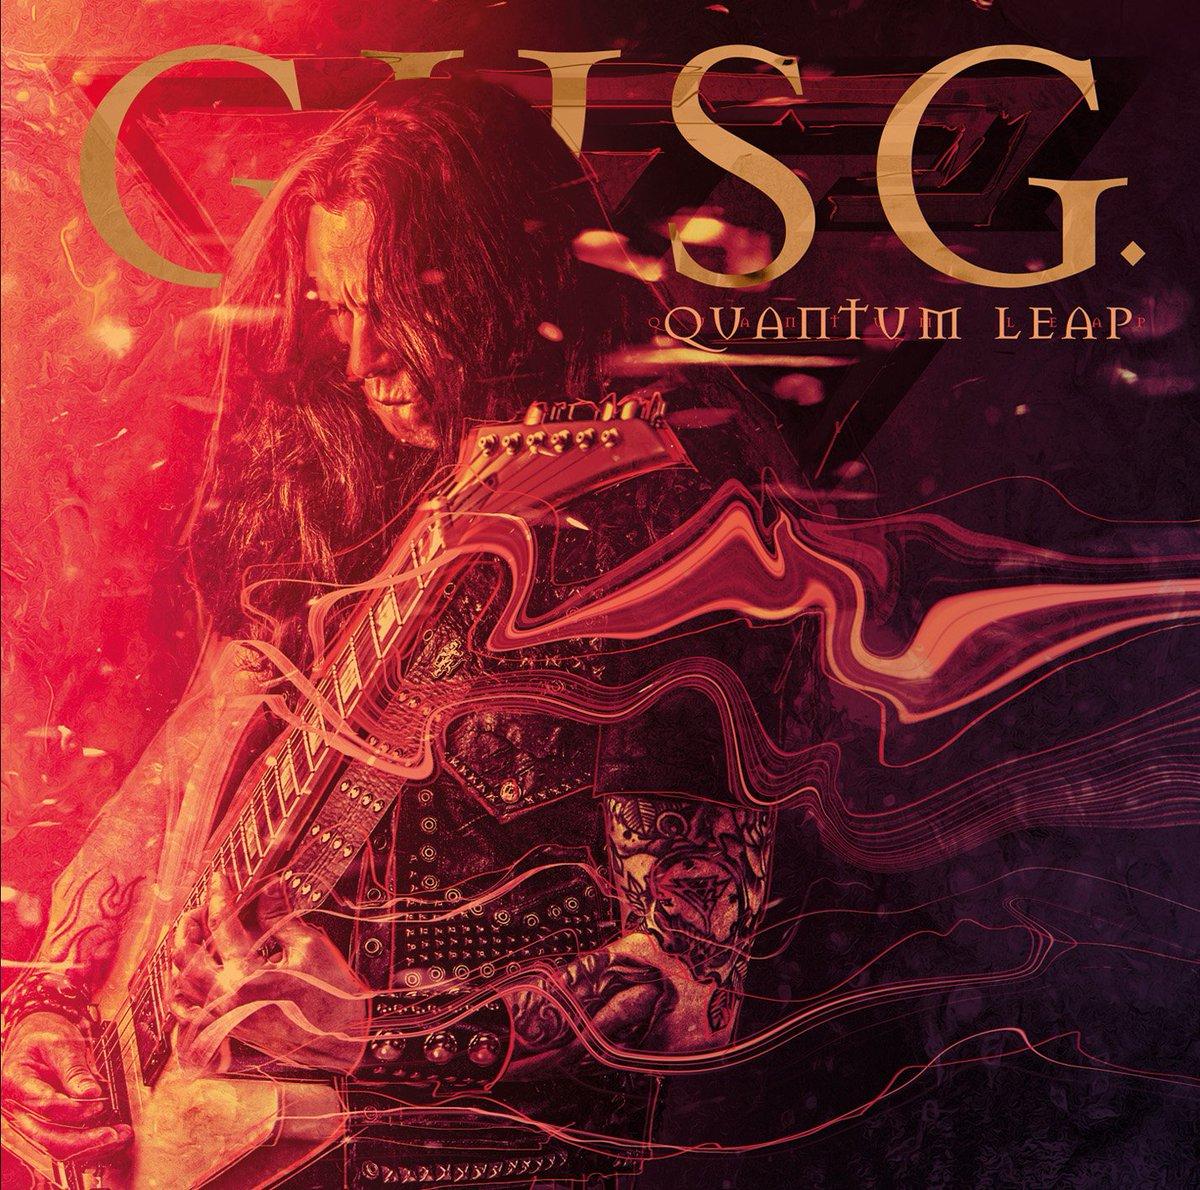 GUS.G Quantum Leap (2021) Instrumental Heavy Metal Grèce E9ejbv10